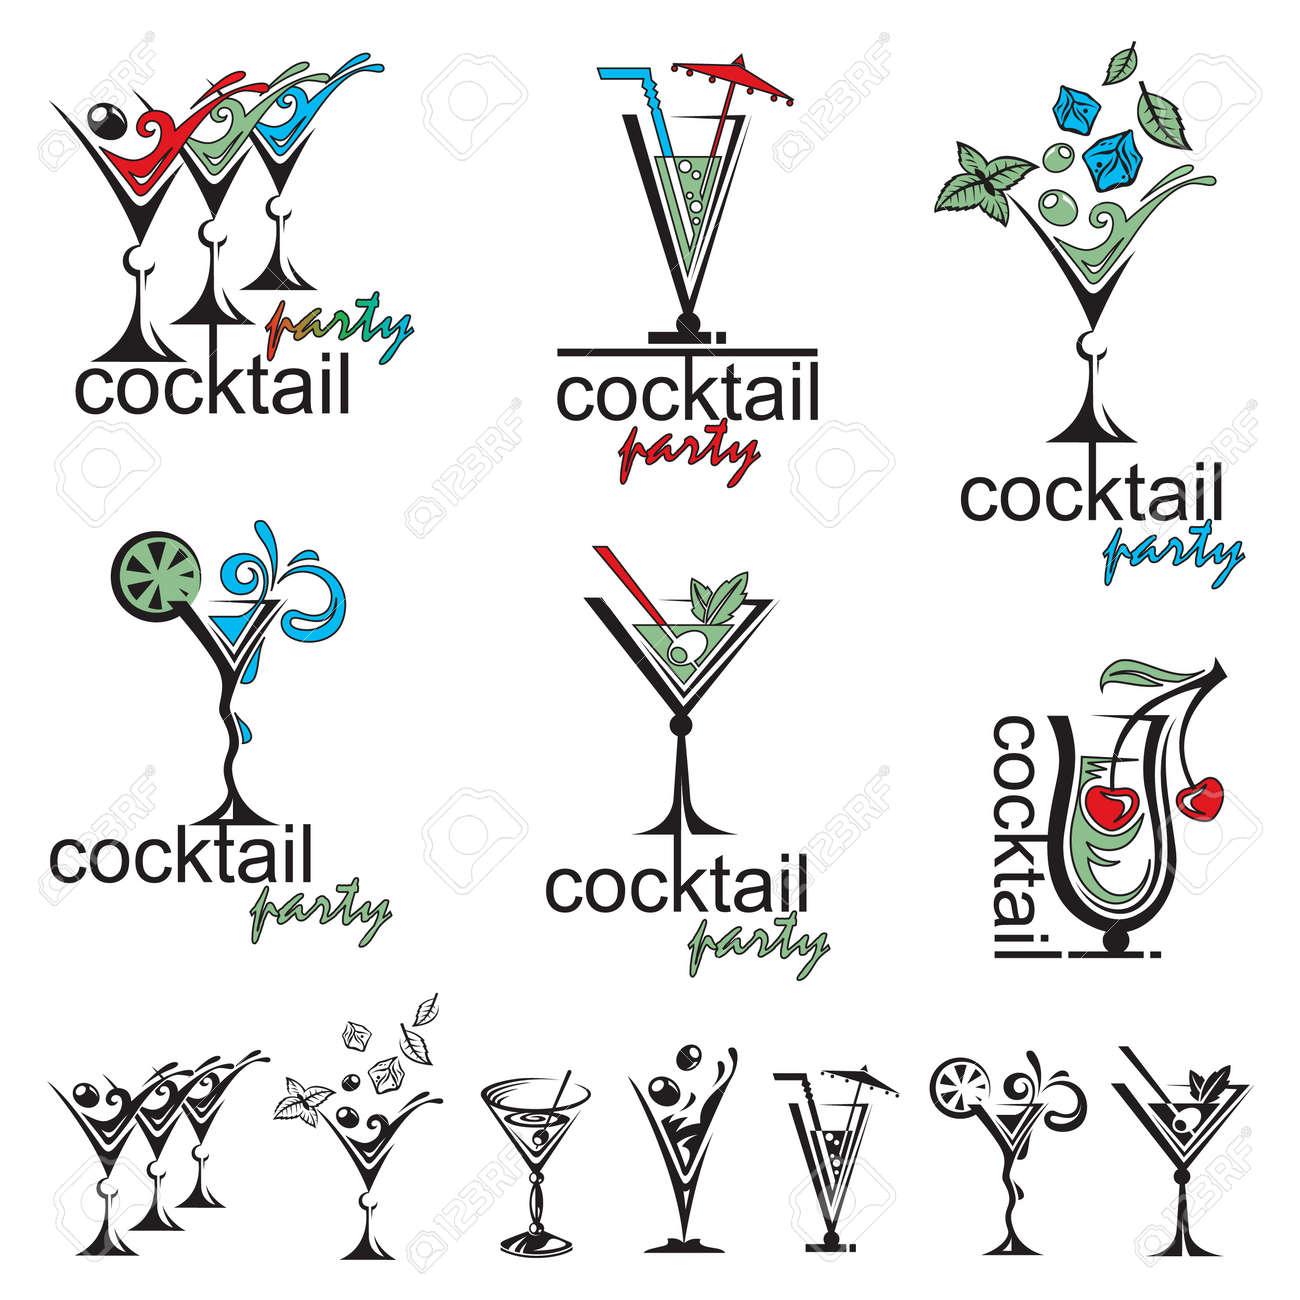 set of different color cocktail glasses - 49574116